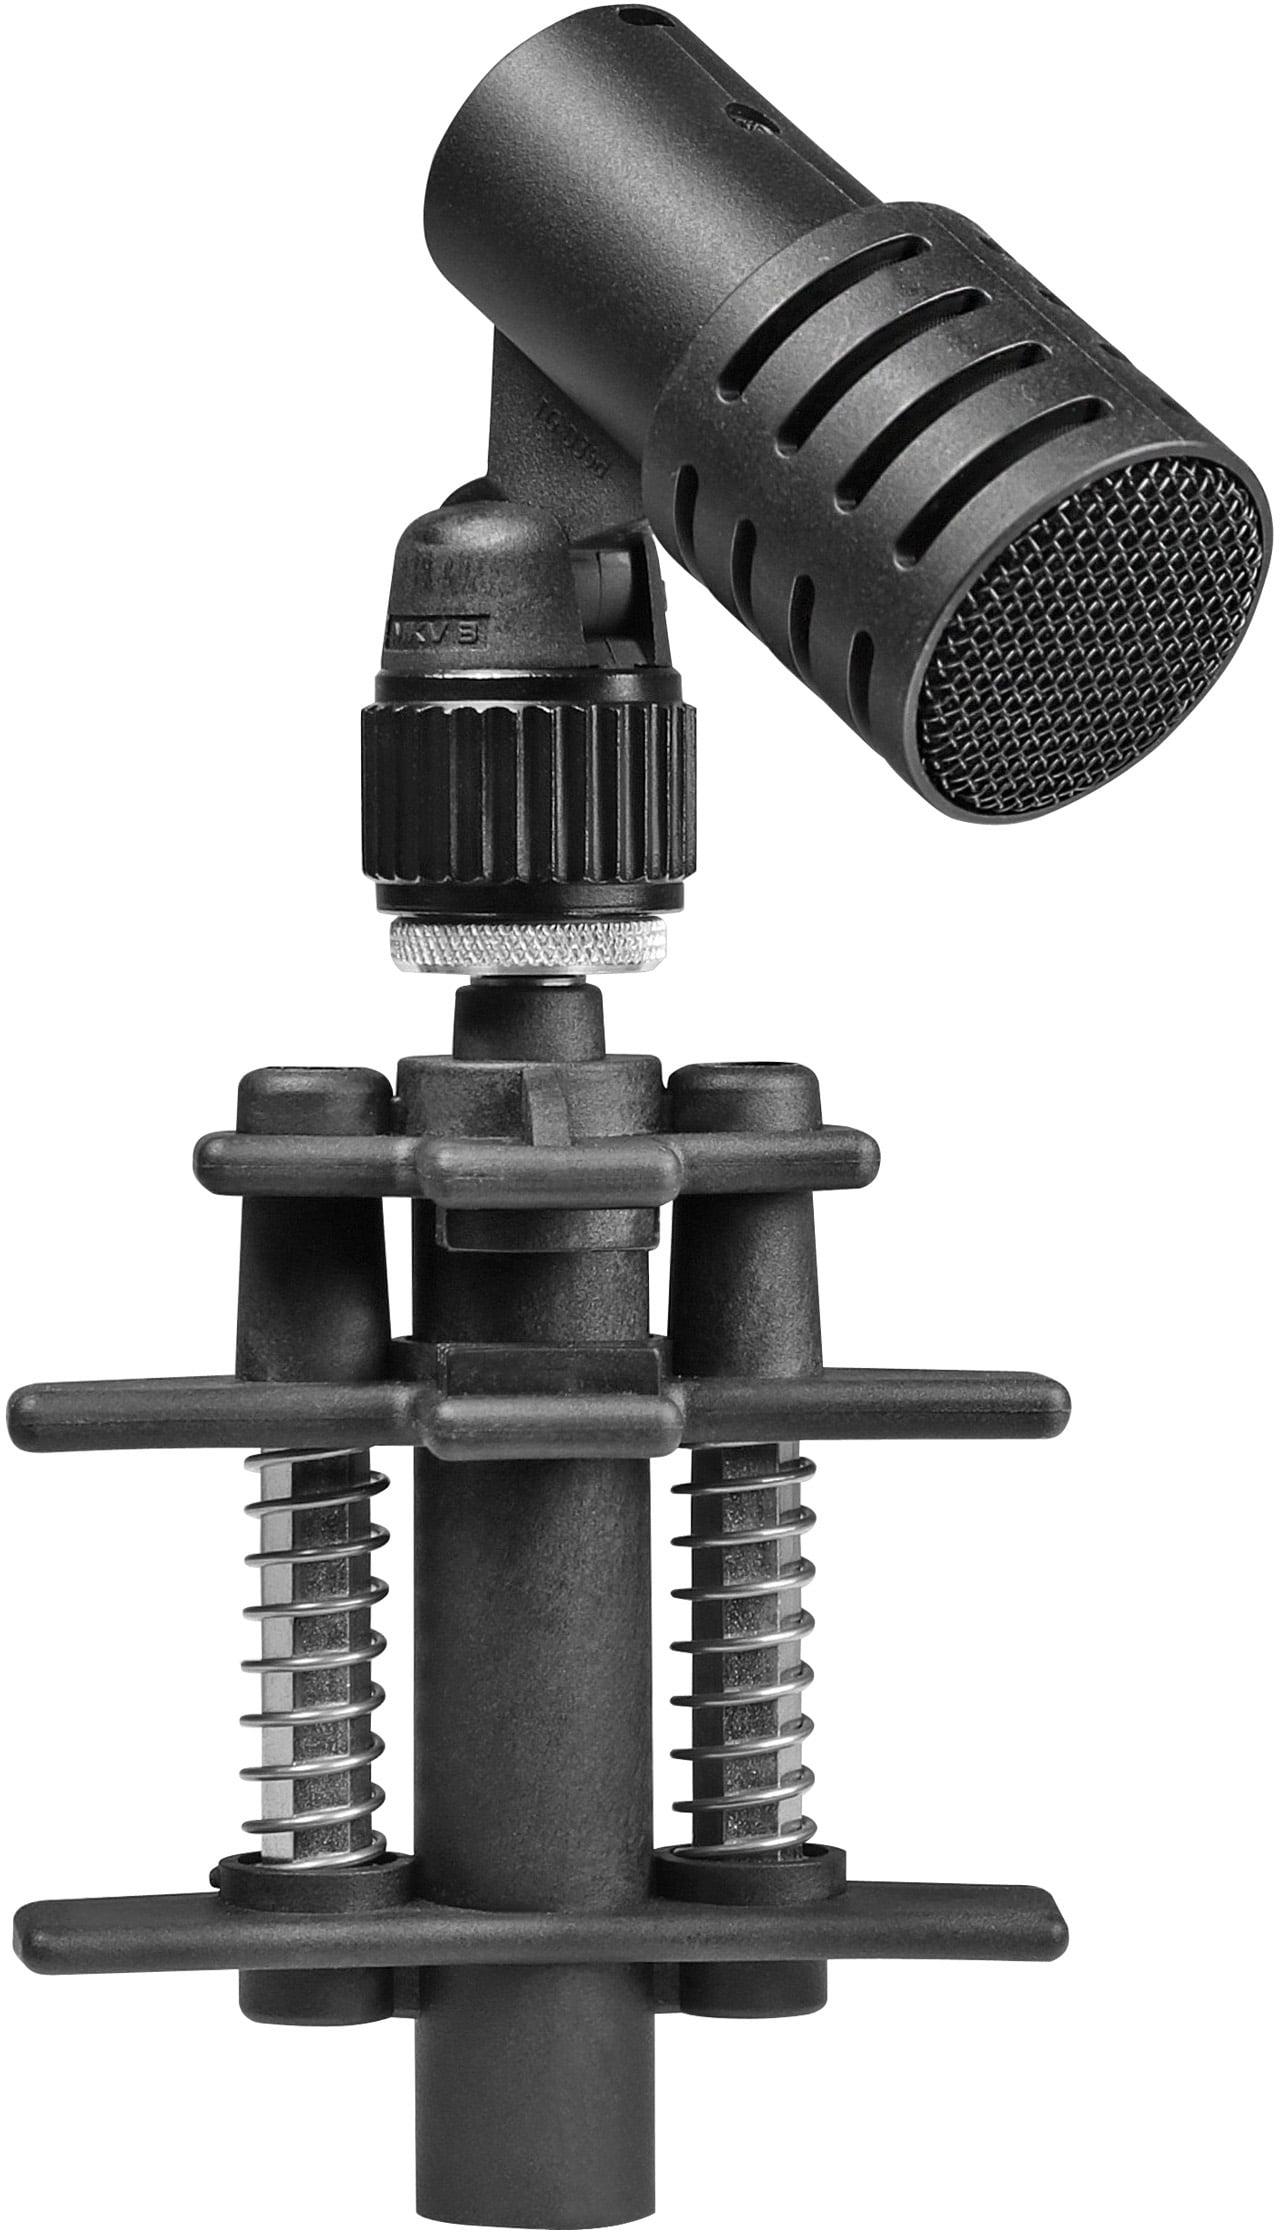 Beyerdynamic TG D35D Dynamic Supercardioid Drum Microphone with Clip by Beyer Dynamics